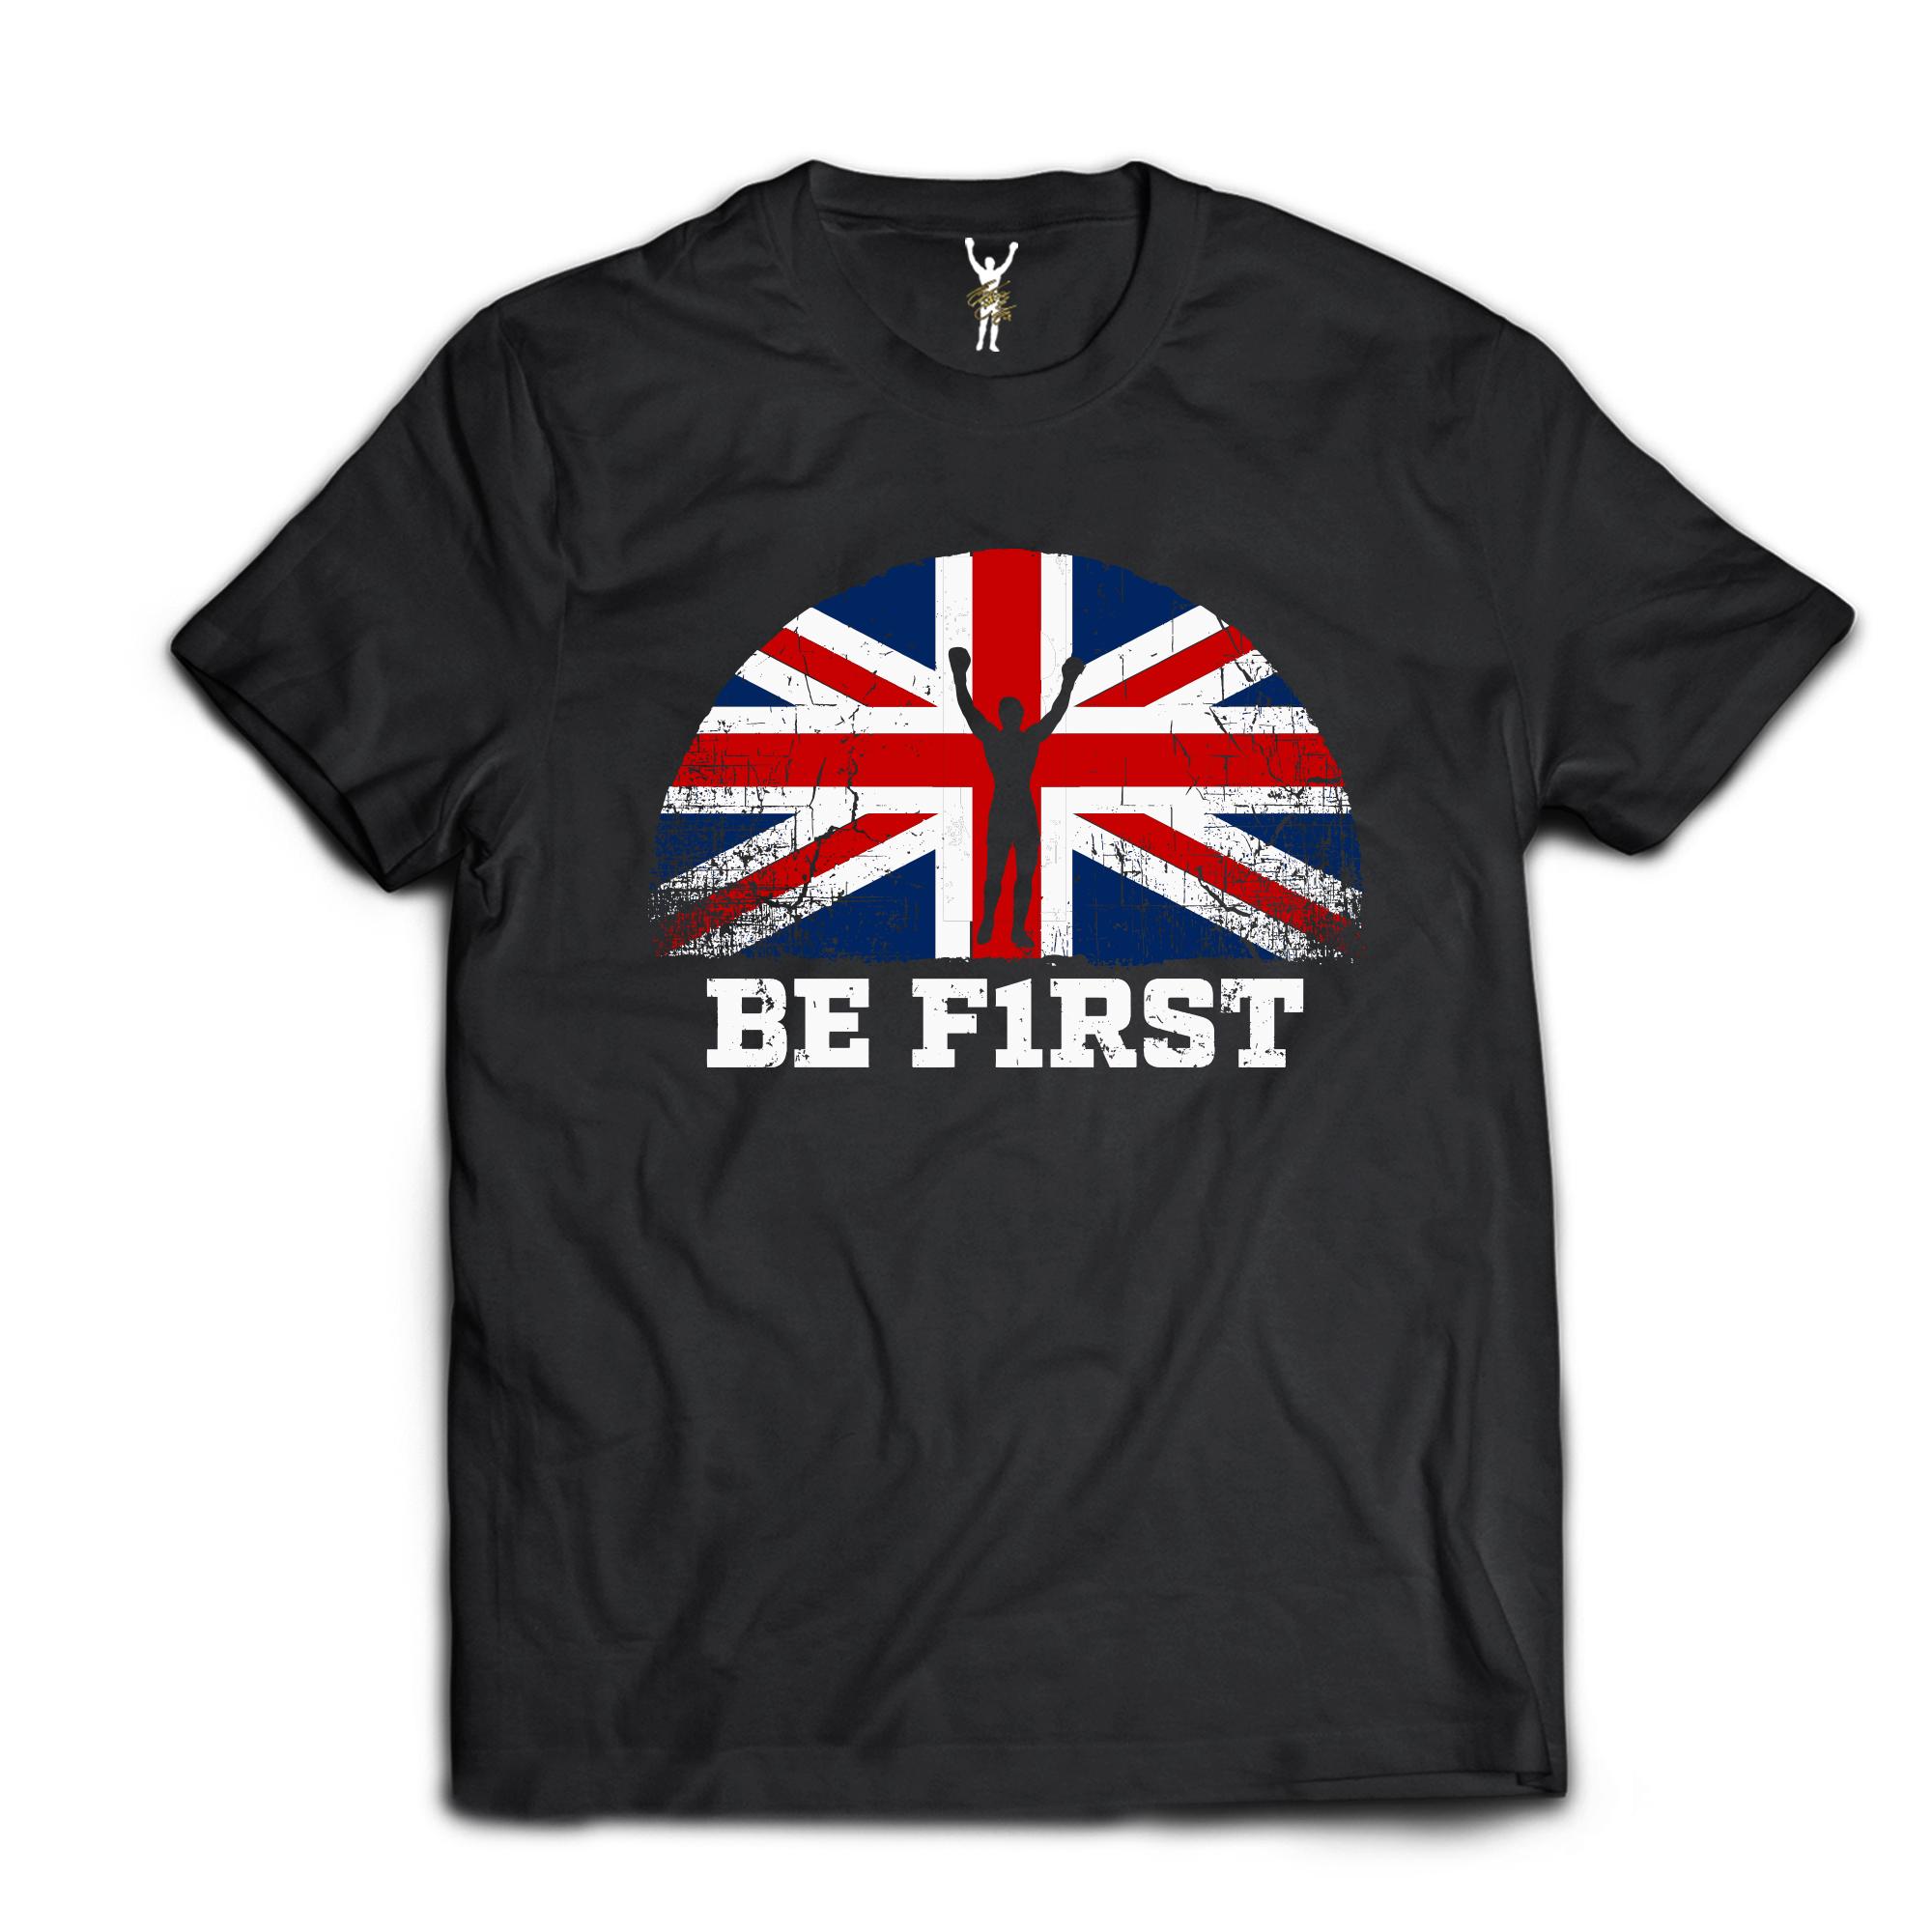 BE F1RST UK Tee